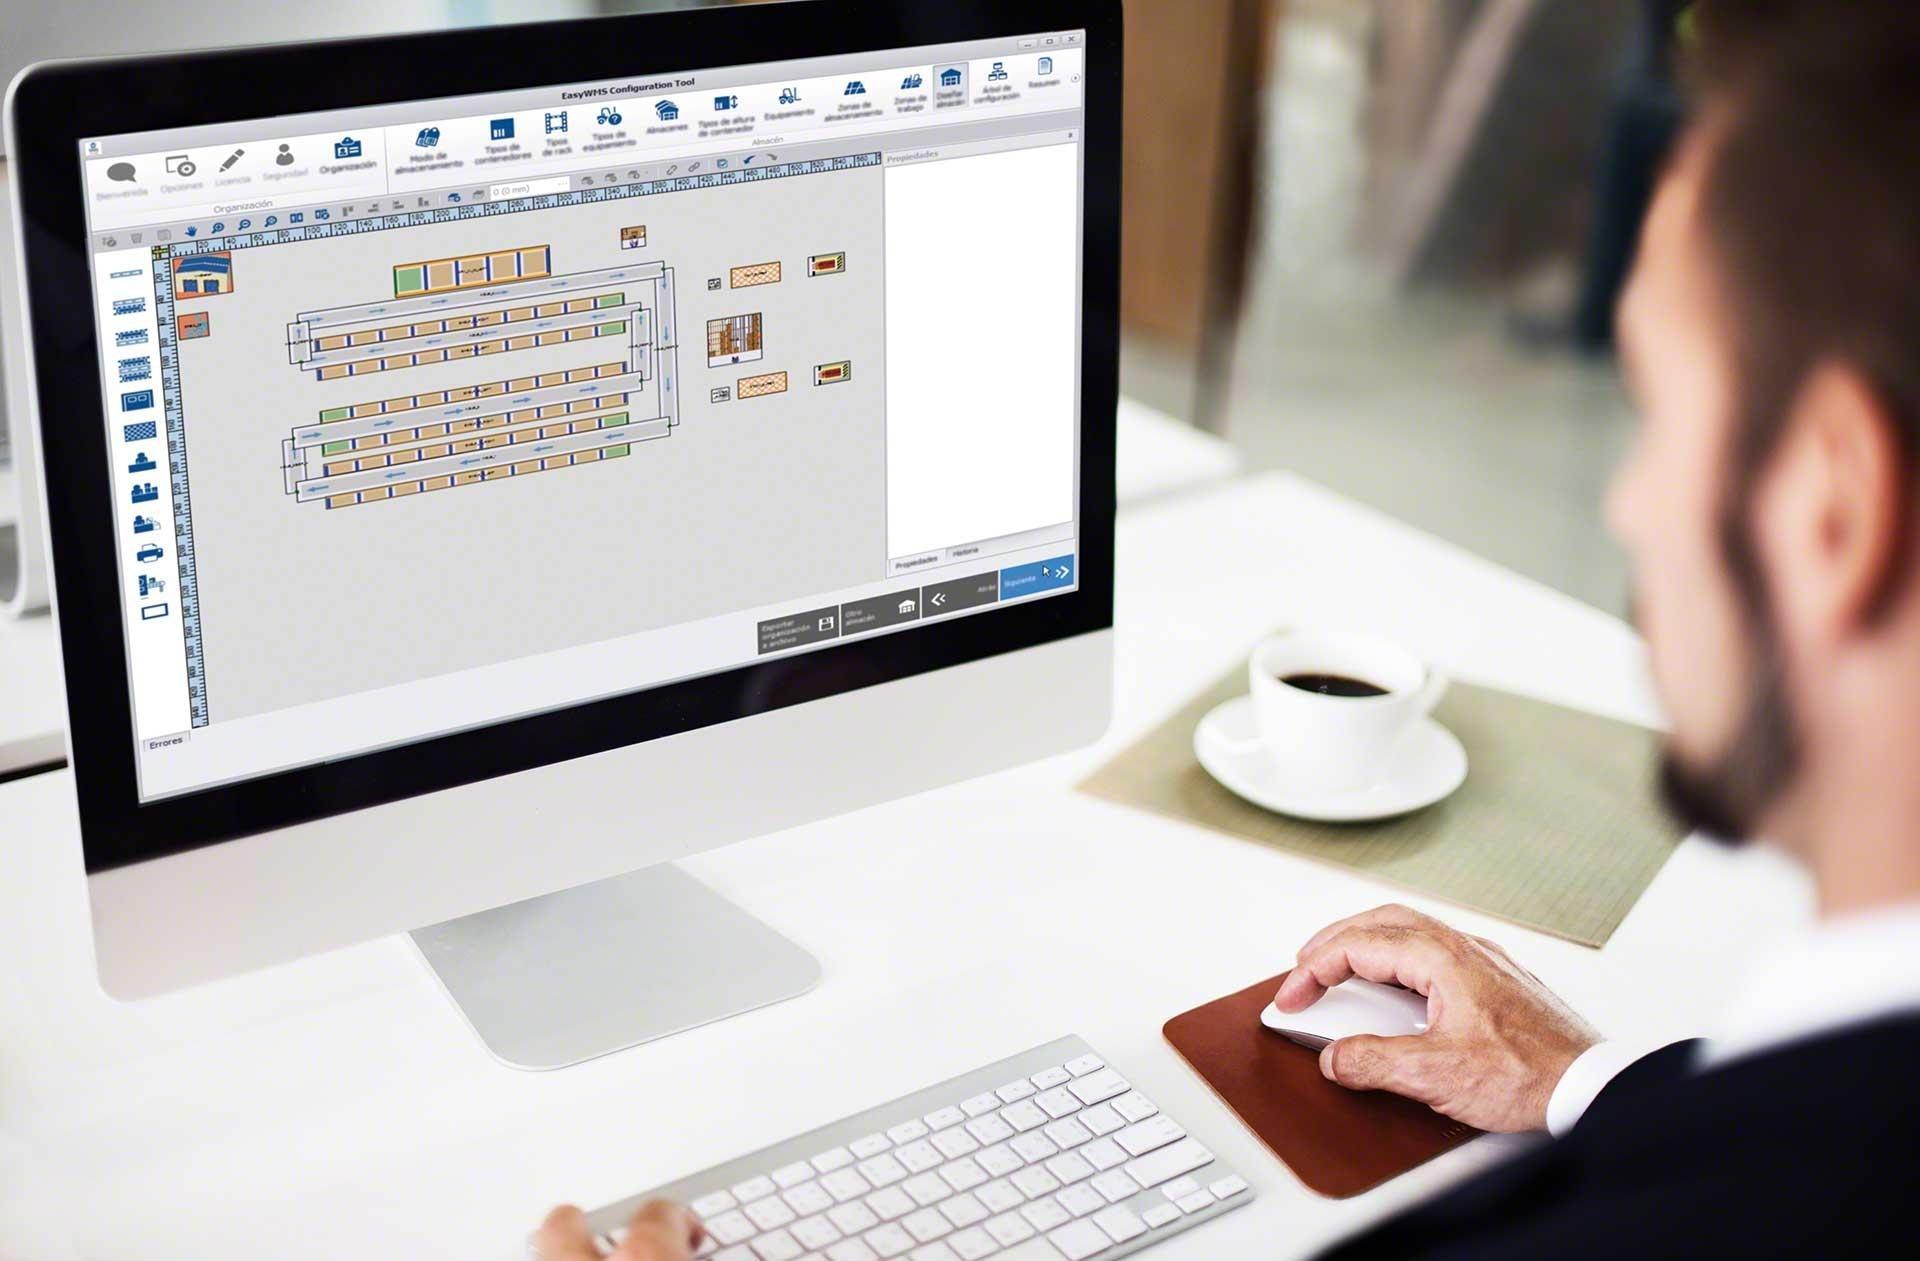 Centro R&S di soluzioni software di Mecalux a Salamanca.